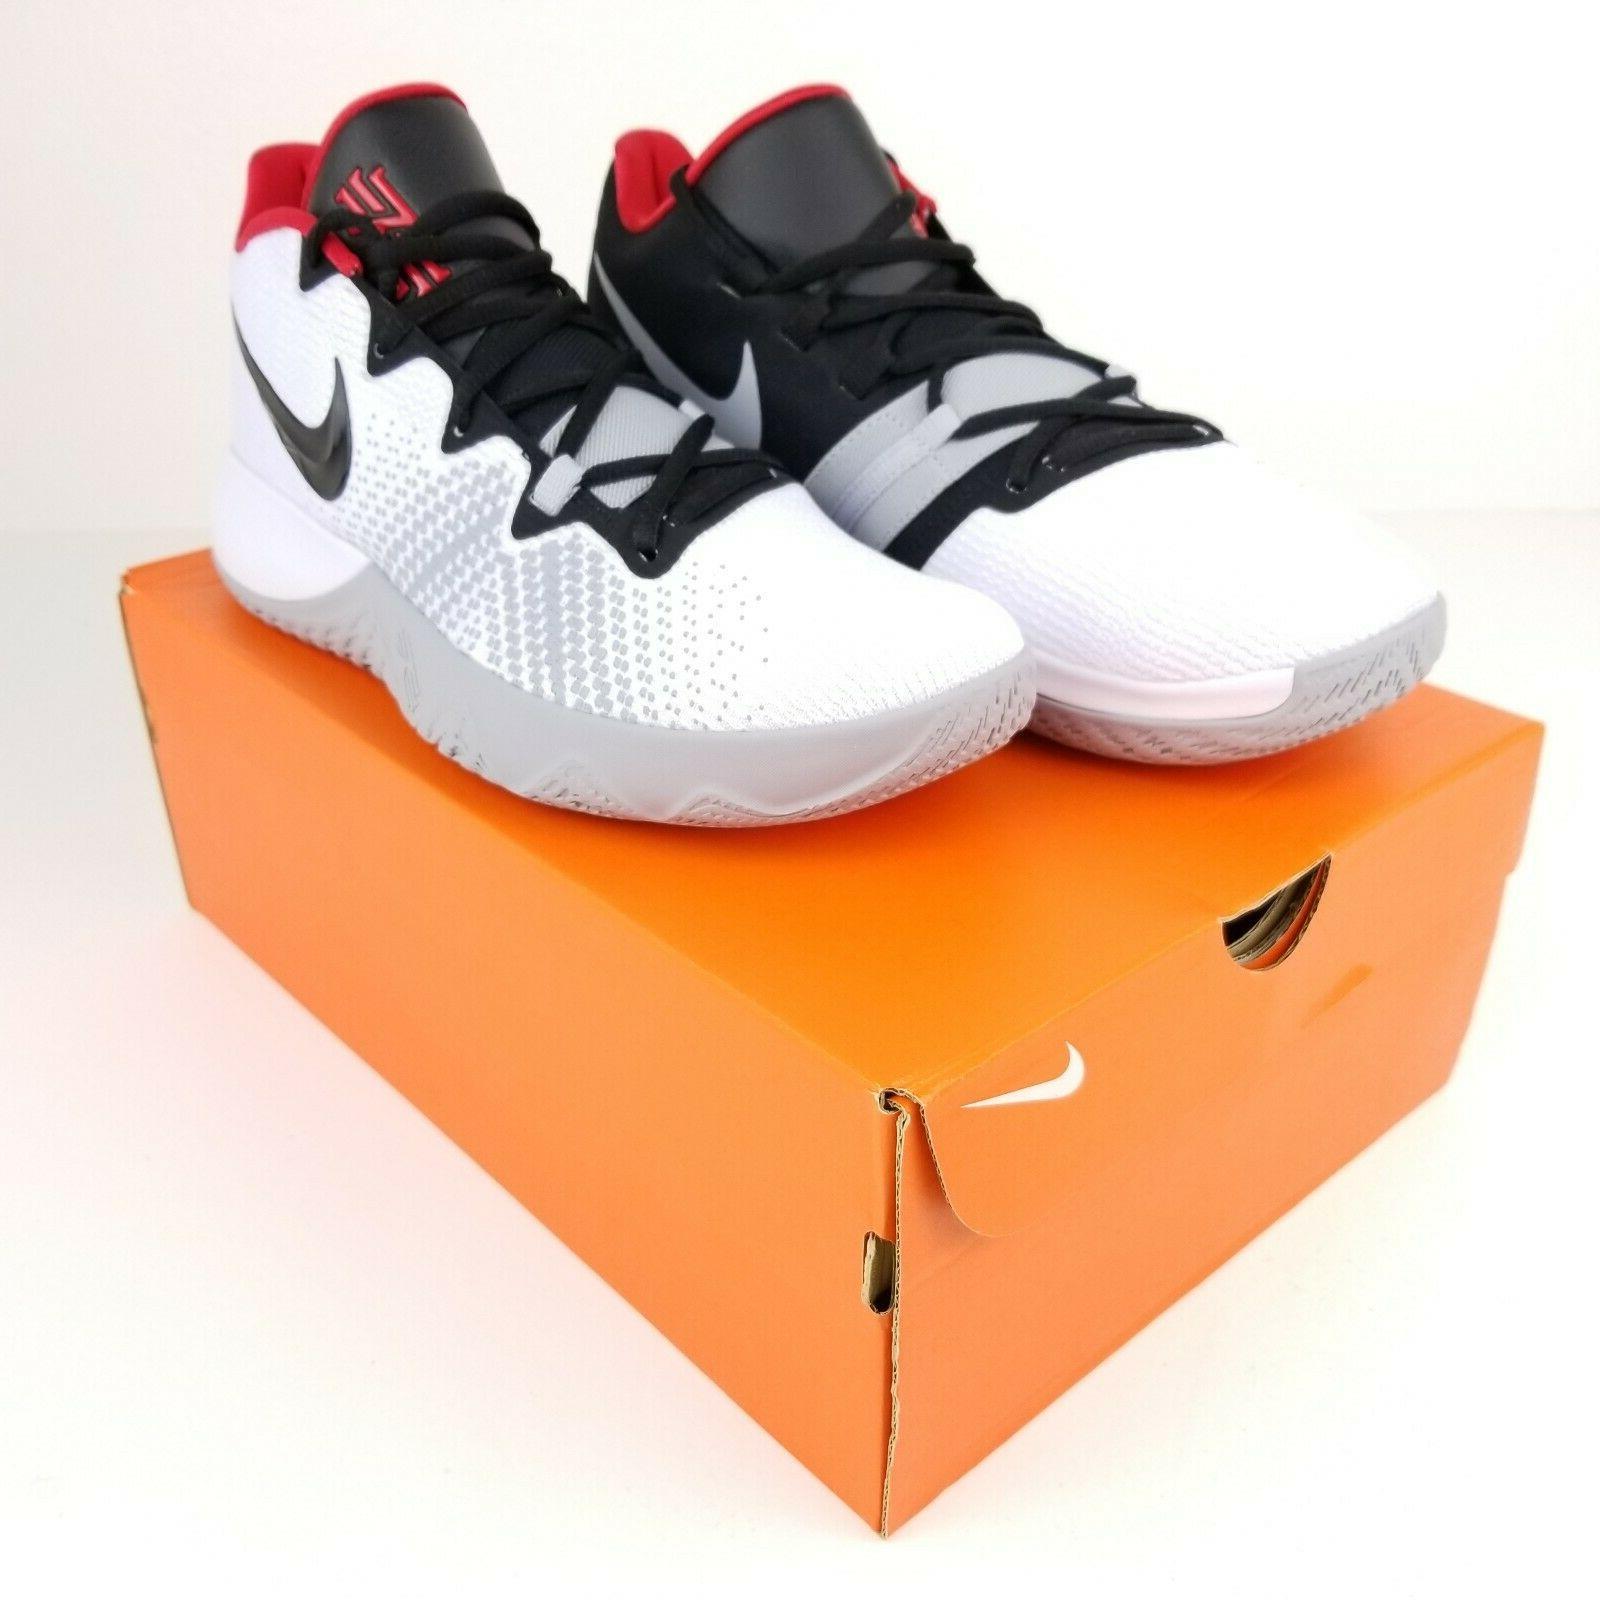 Nike Basketball Shoes AA7071 White 9-14